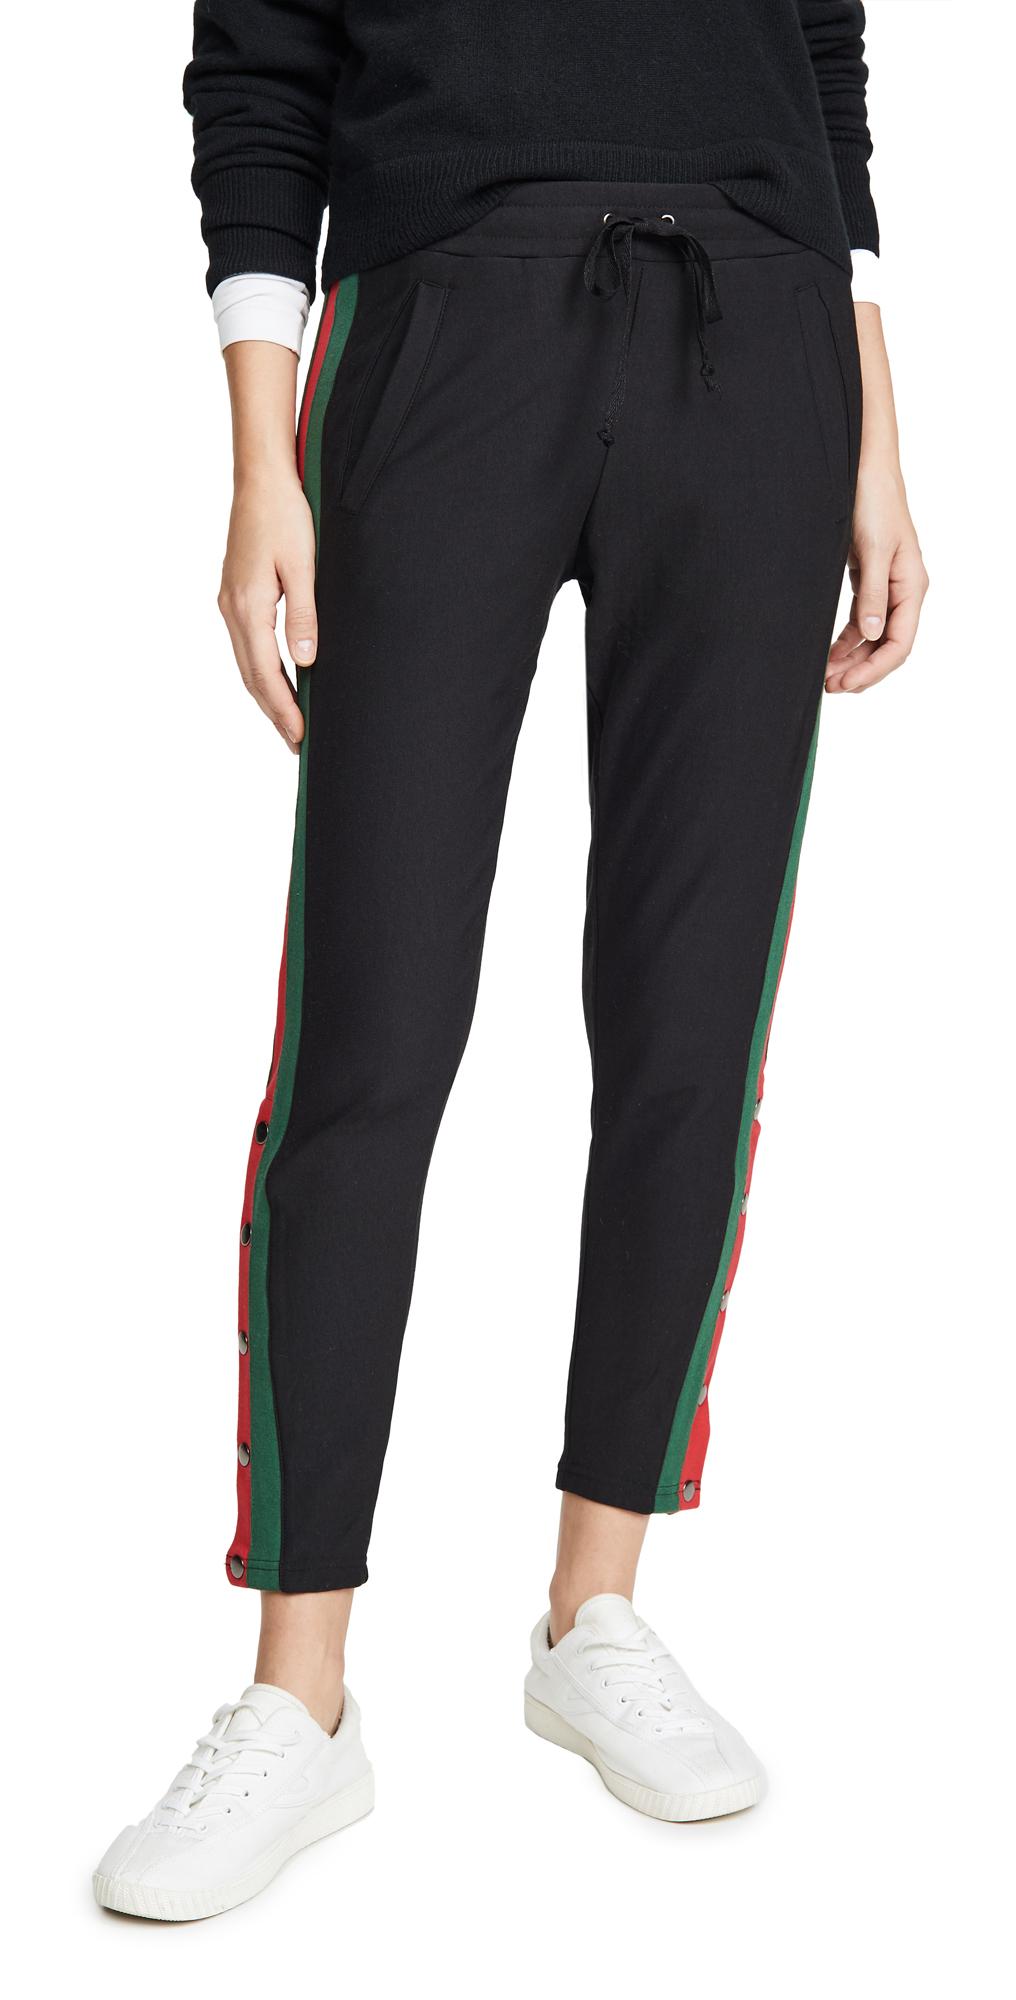 Plush Fleece Lined Tuxedo Track Pants